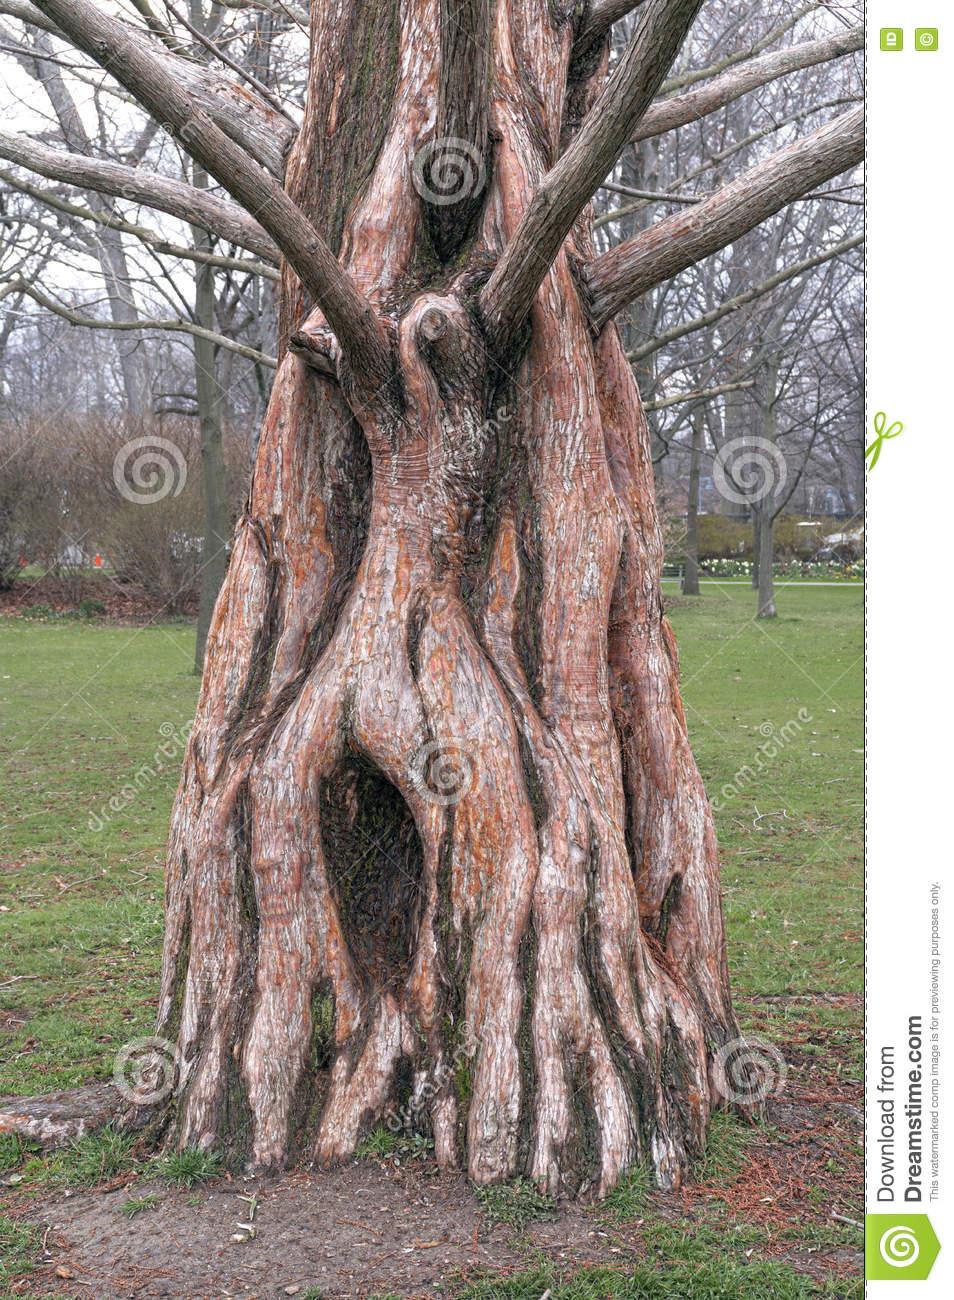 Trunk Of Dawn Redwood (Metasequoia Glyptostroboides) Stock Photo.